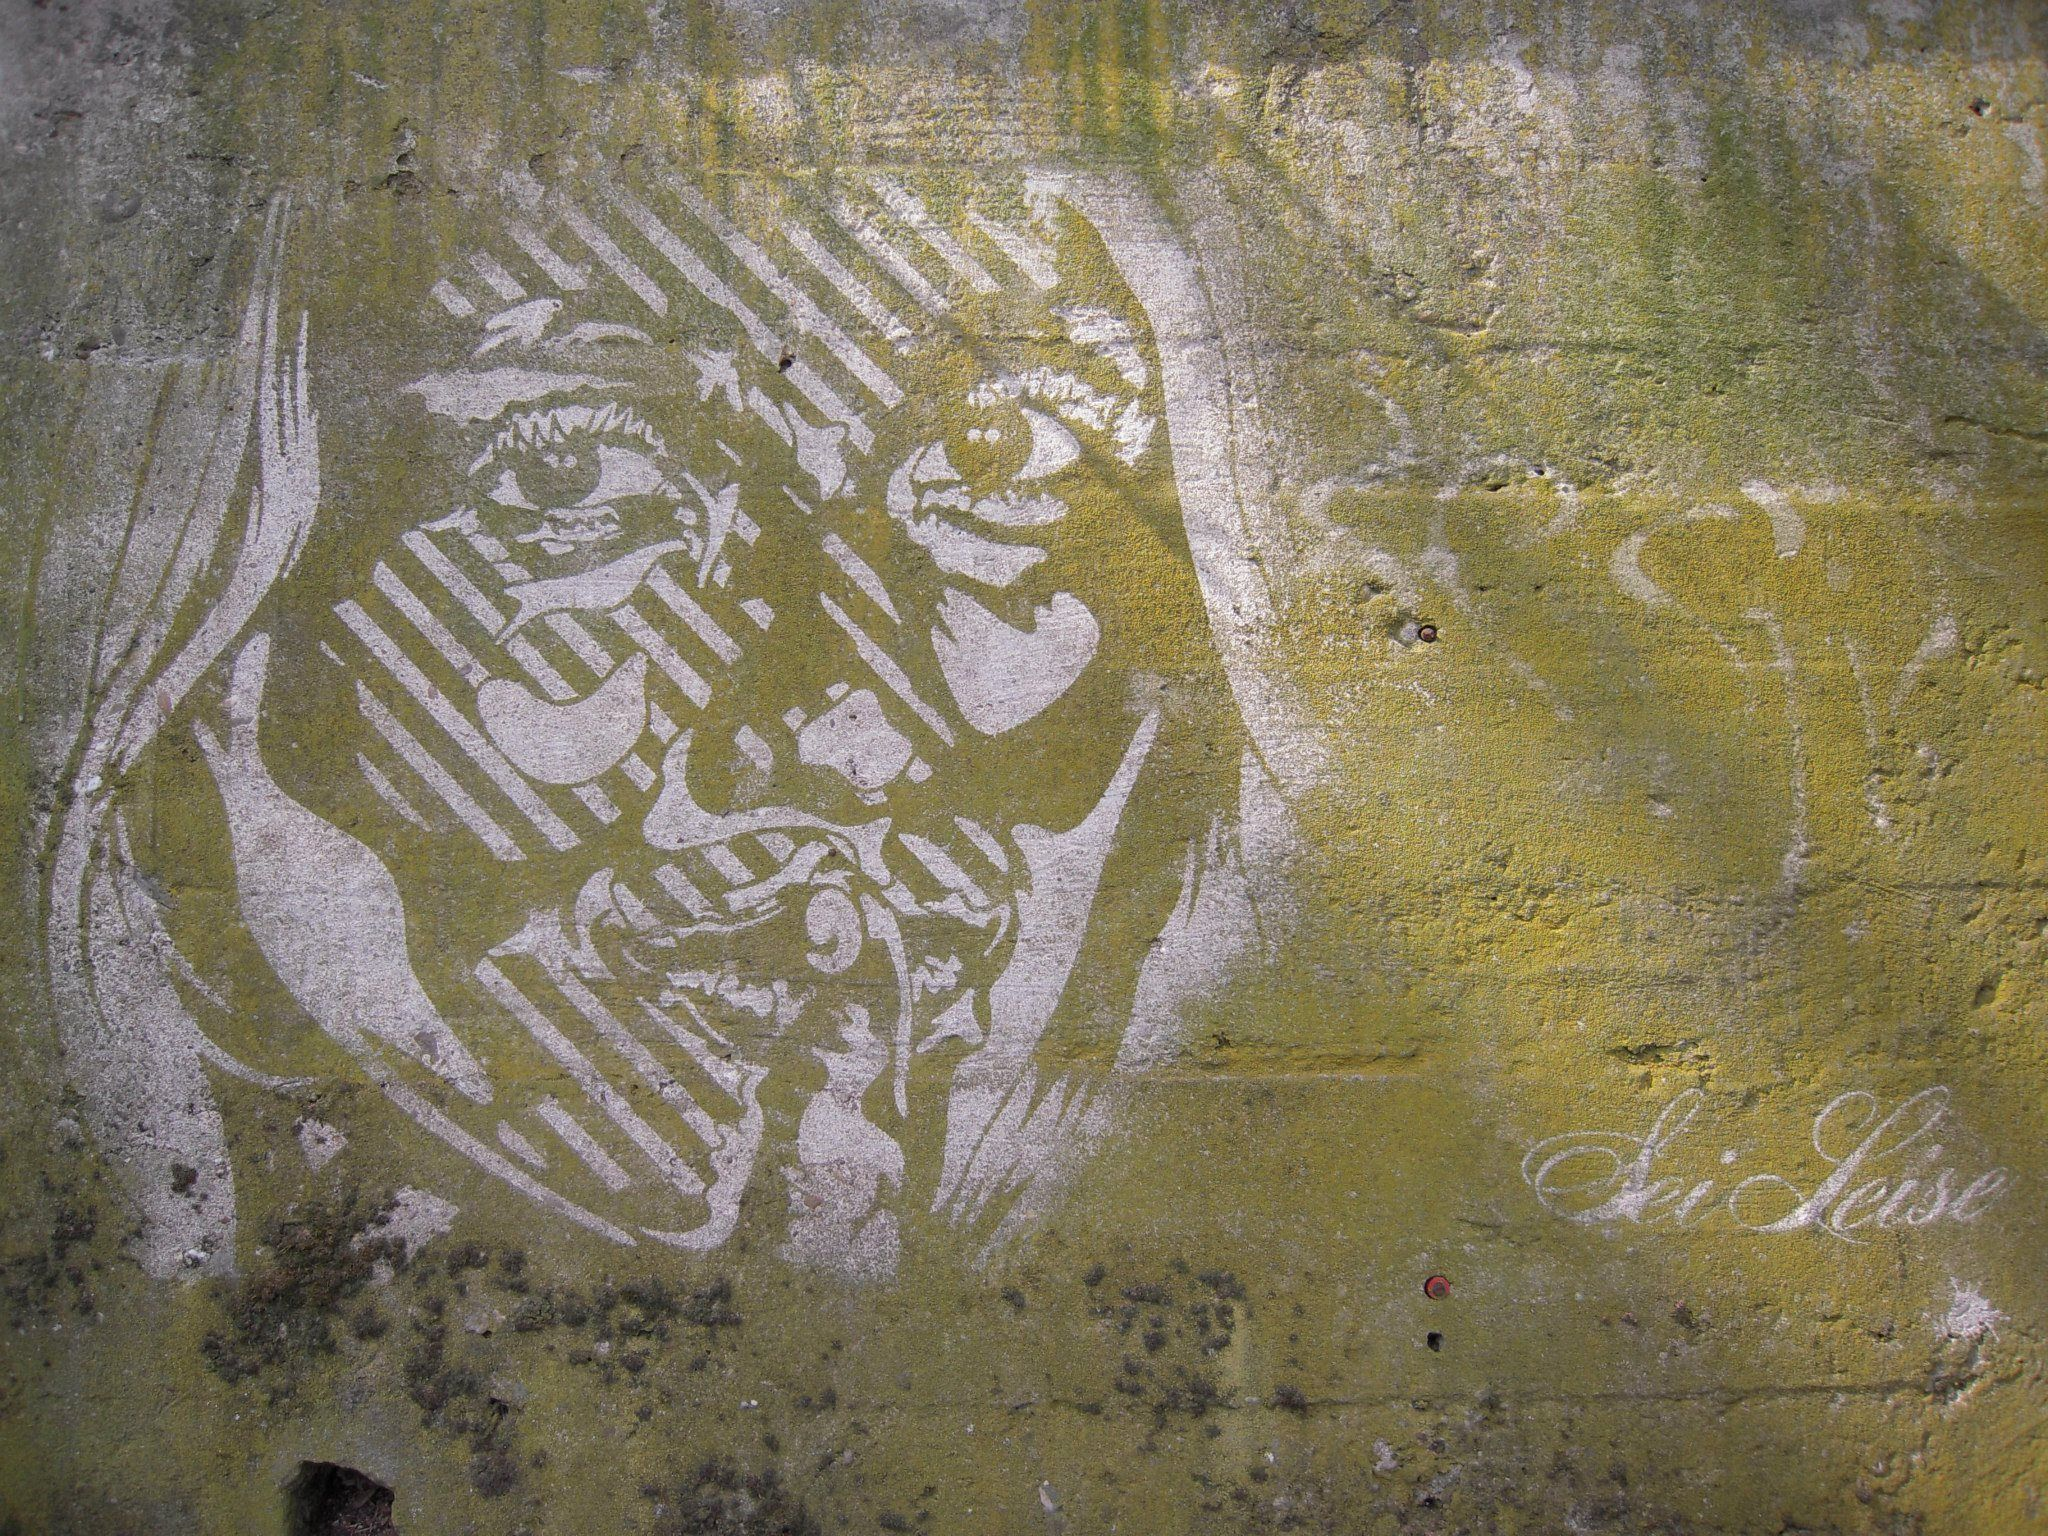 seiLeise Reverse Graffiti